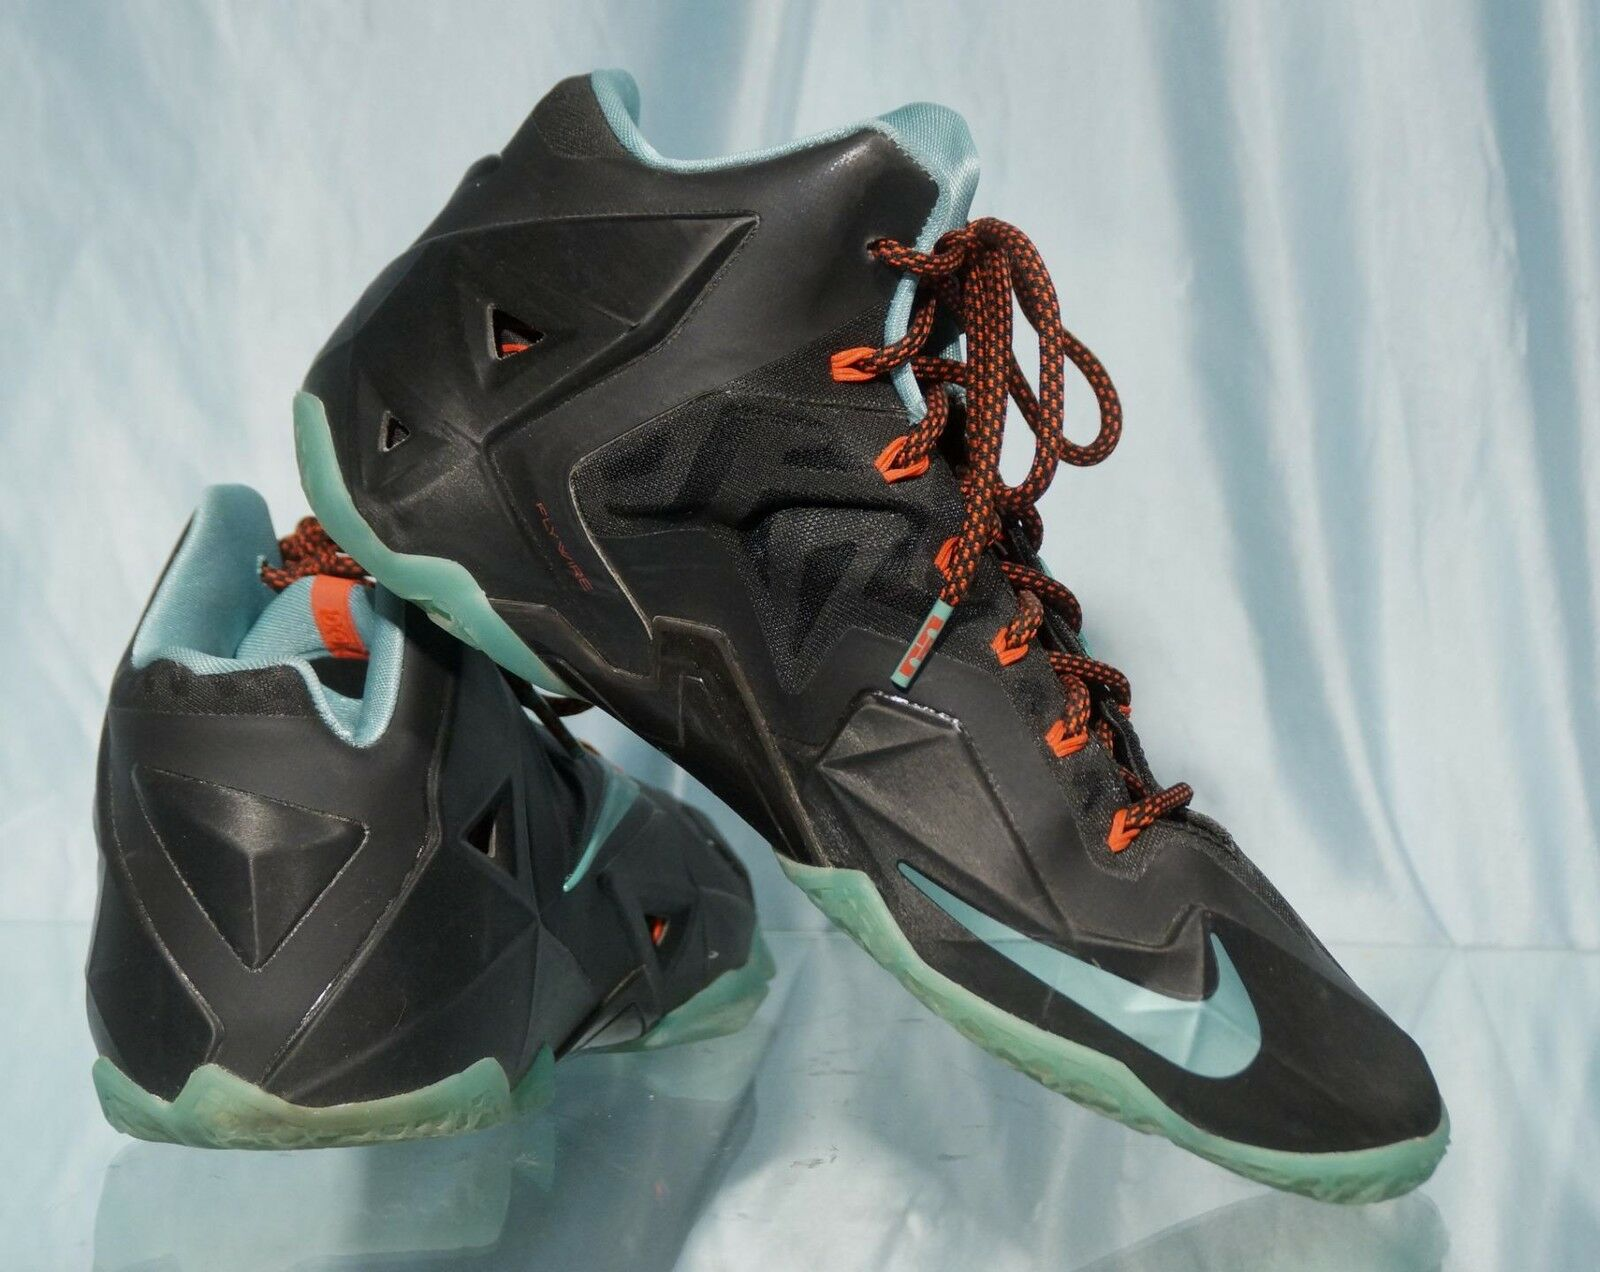 - nero & & & blue nike flywire king james basket sopra le scarpe basse sz 10 ce0205